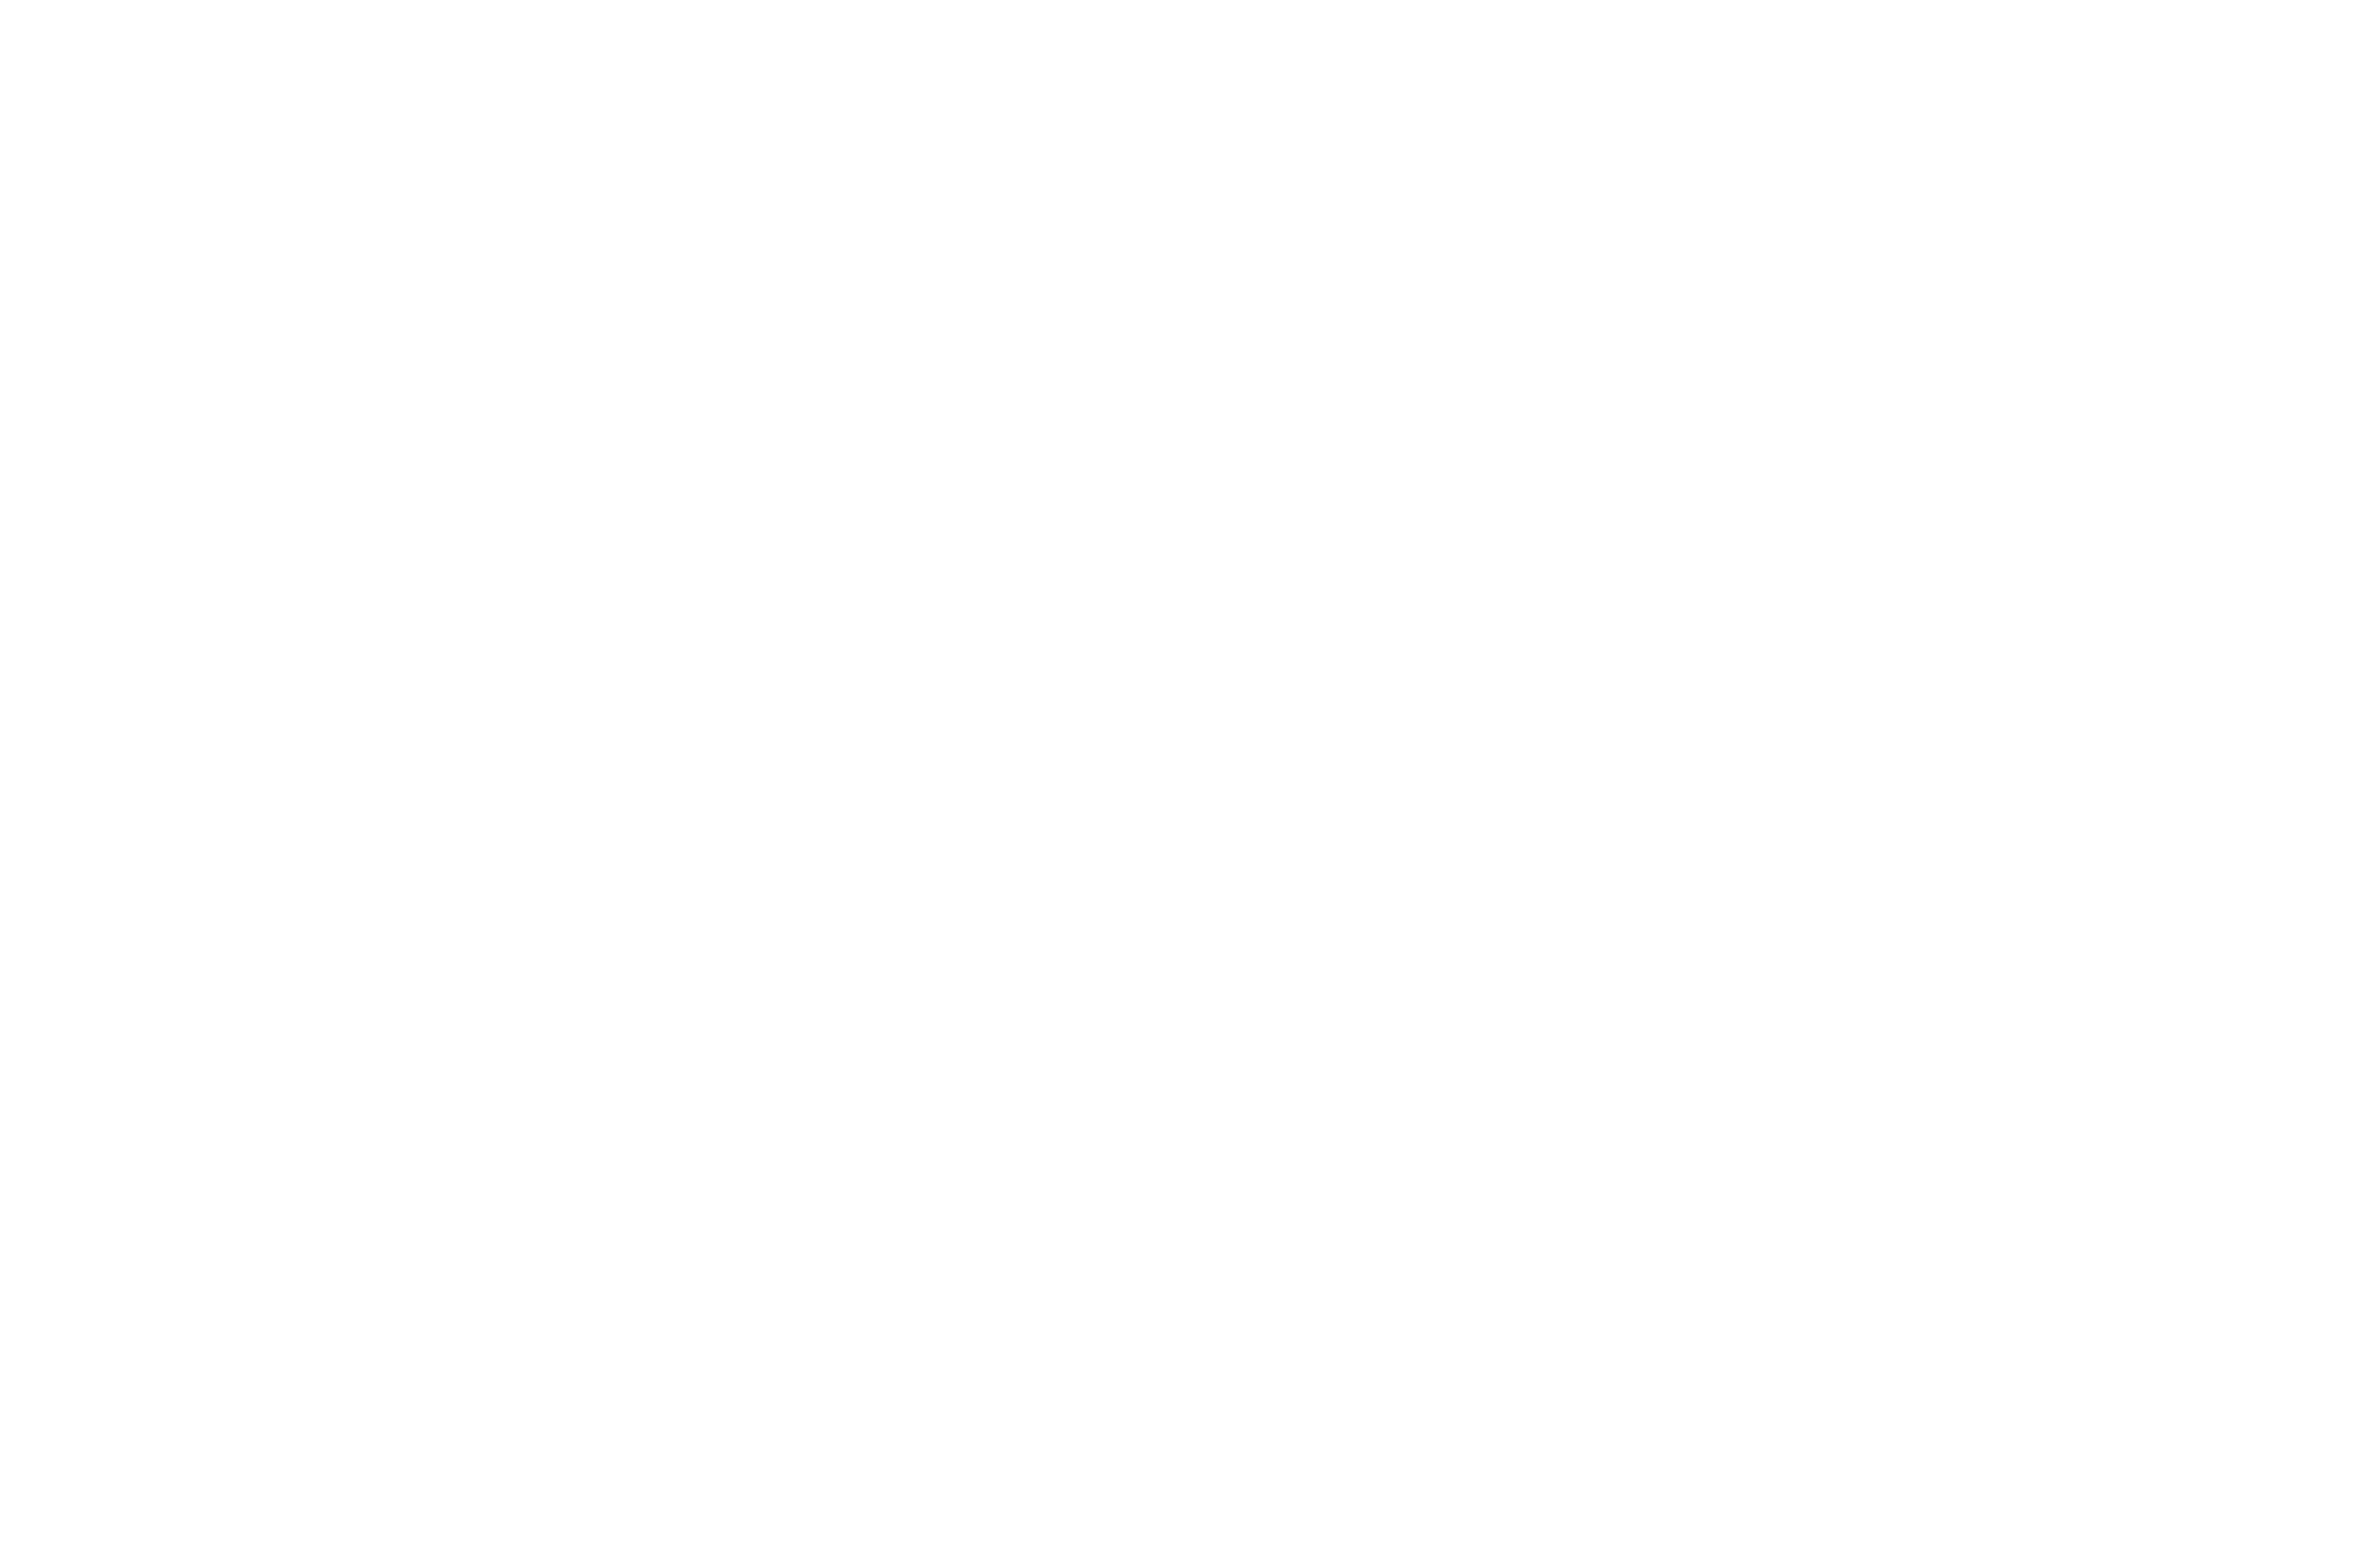 kion_logo_white_full